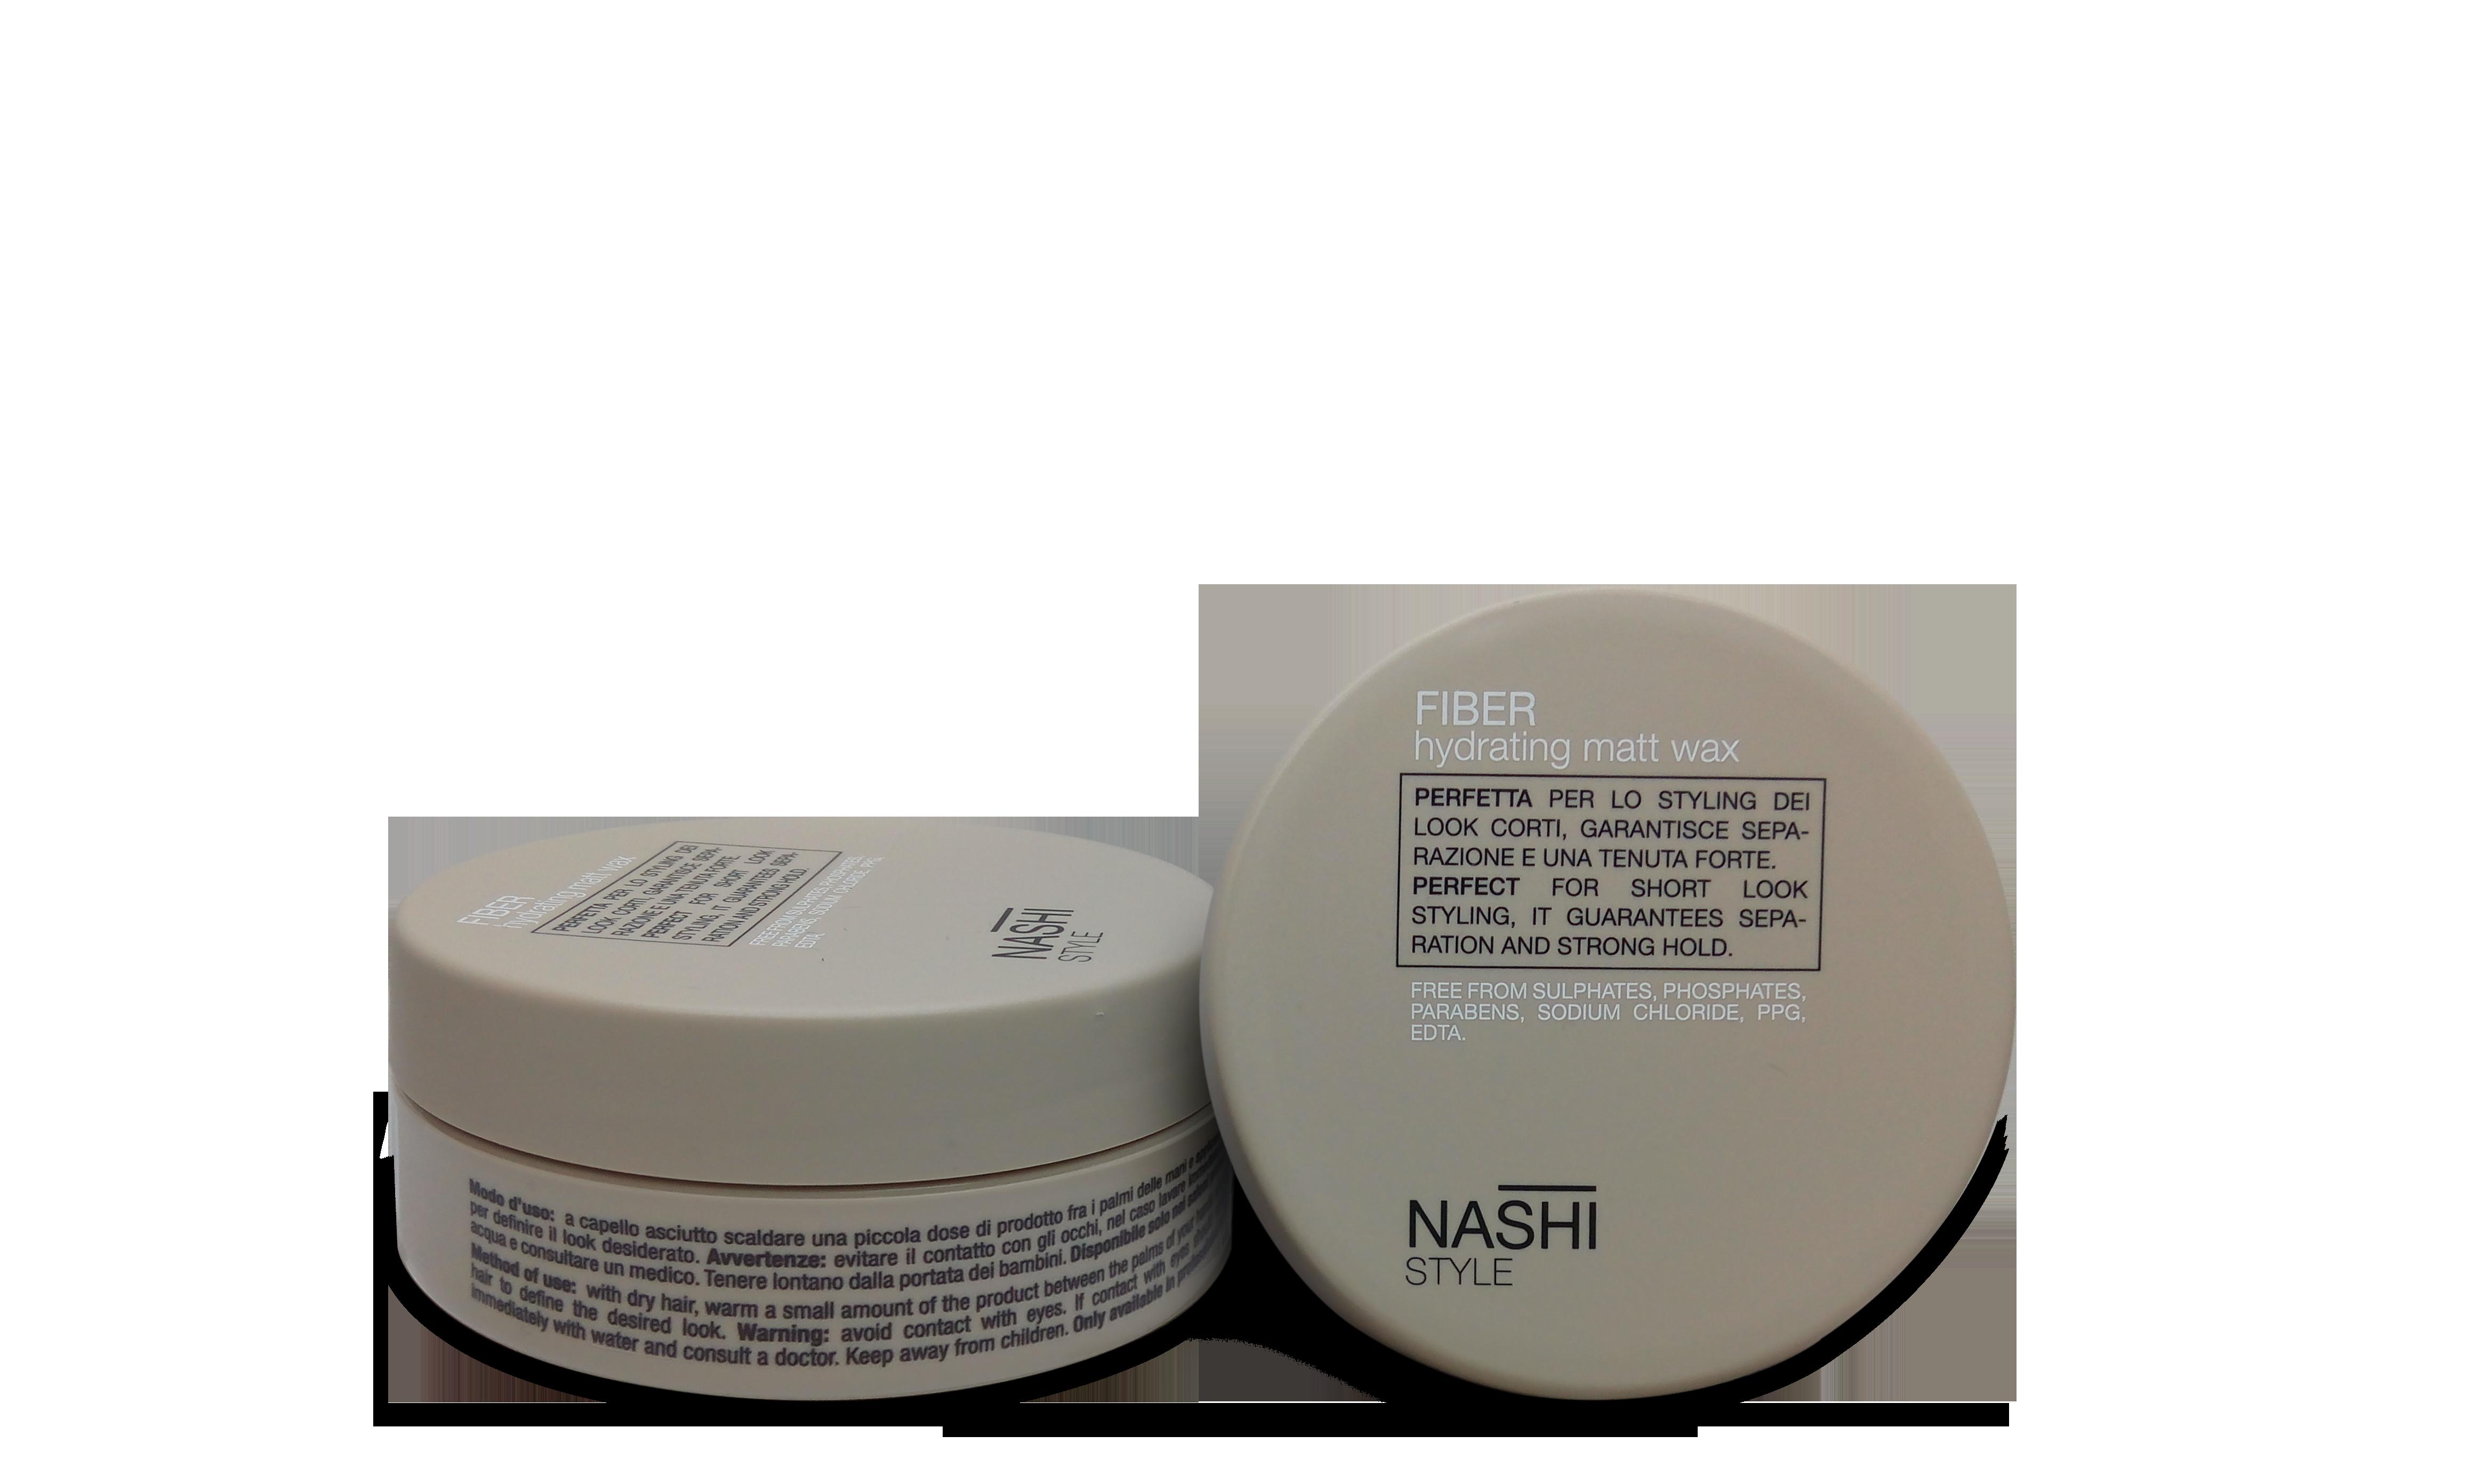 NH0100_NASHI FIBER_50 ml